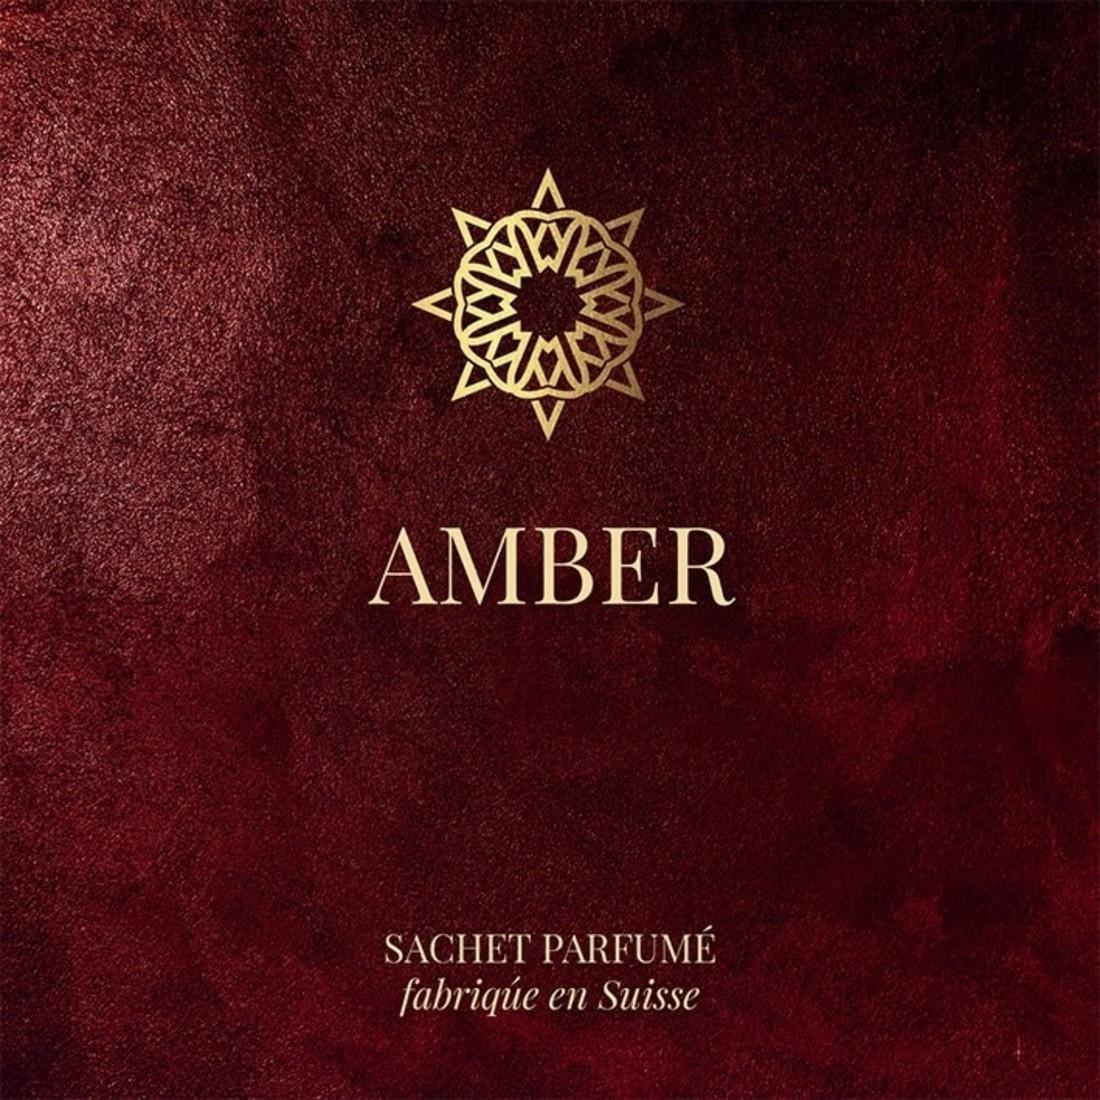 Duftsachet - Amber